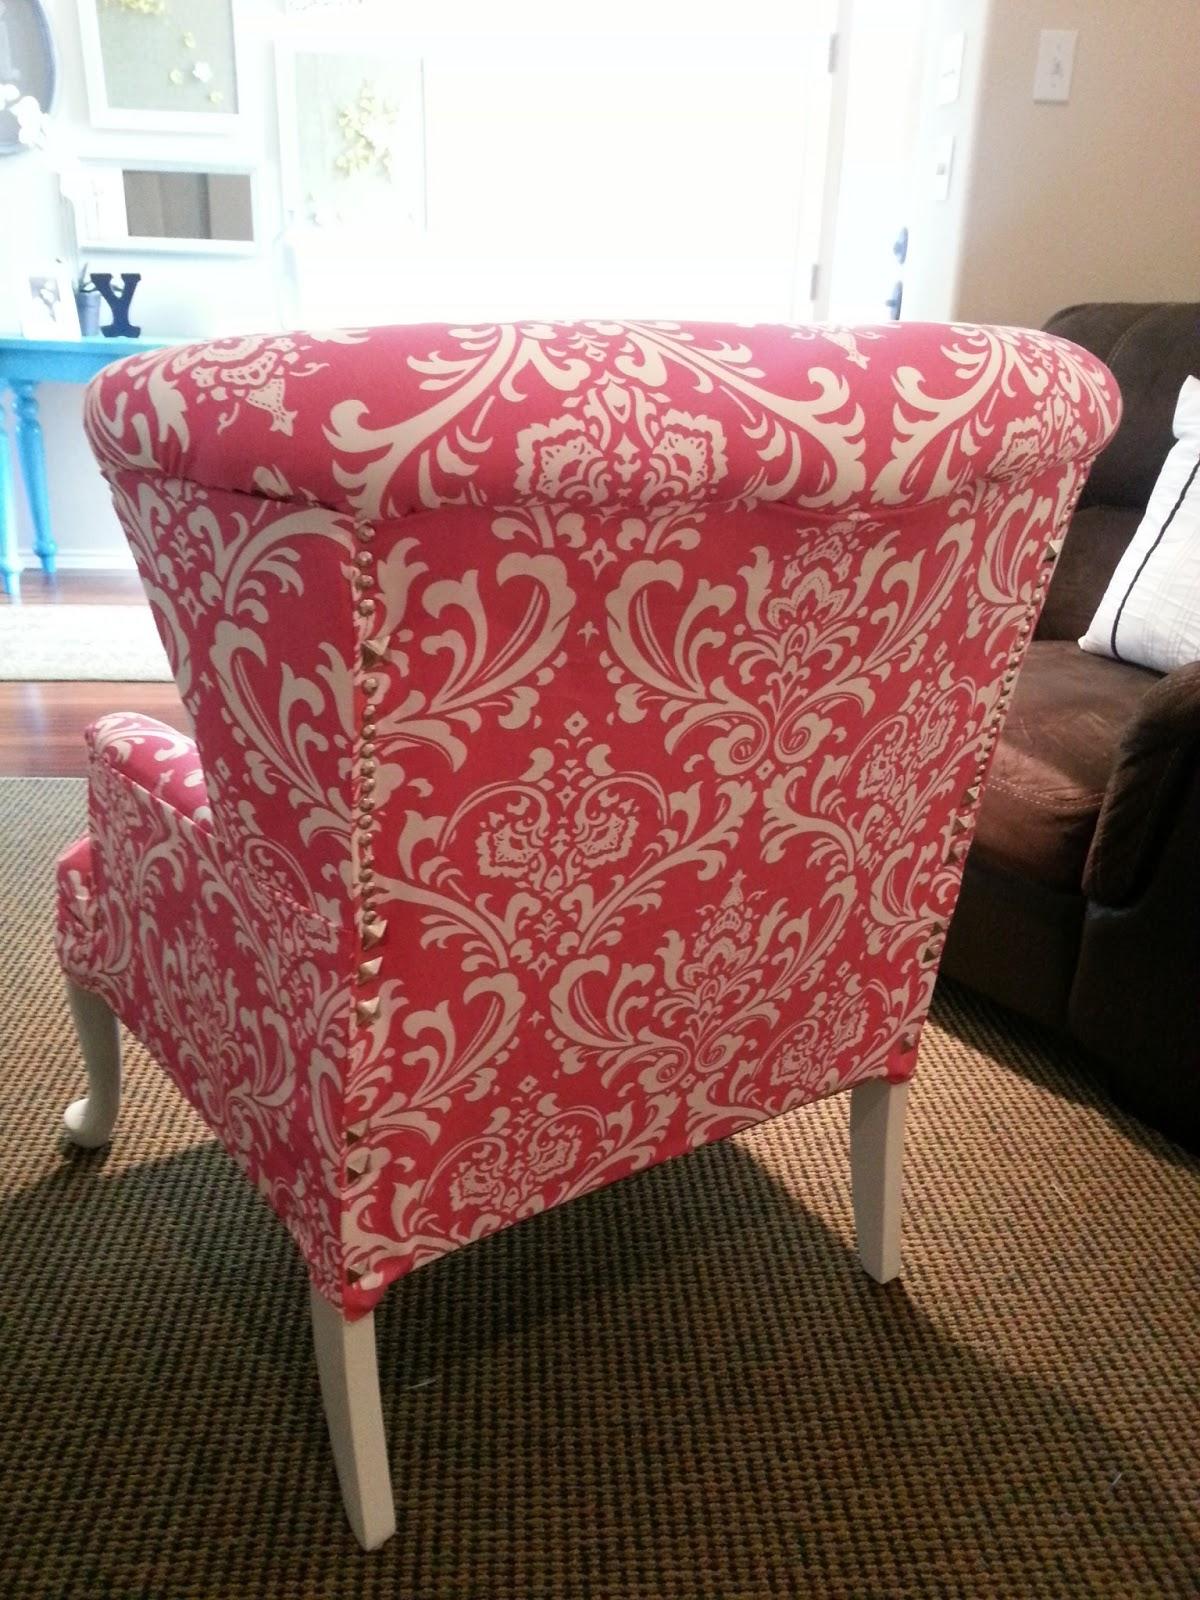 DIY: Chair Re-upholstery Tutorial